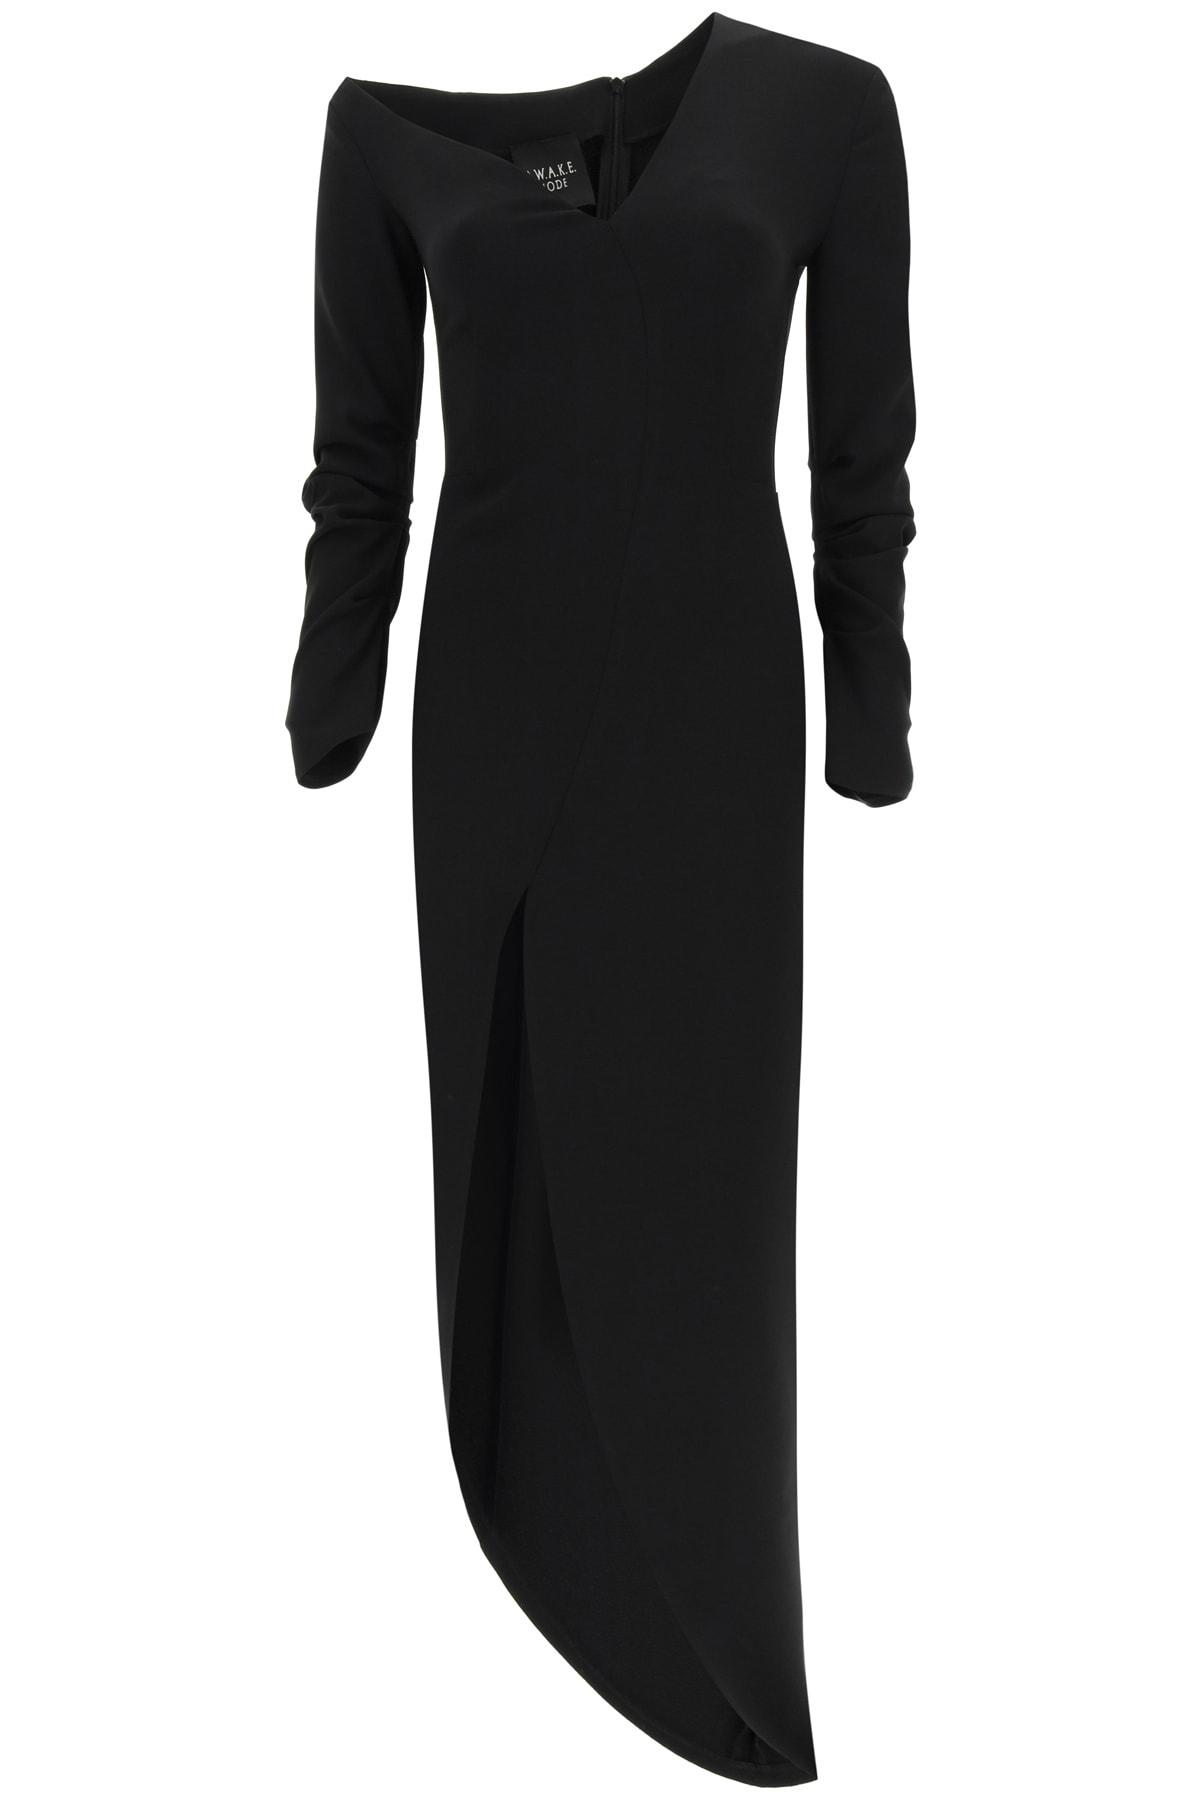 Buy A.W.A.K.E. Mode Asymmetric Dress In Crepe Jersey online, shop A.W.A.K.E. Mode with free shipping